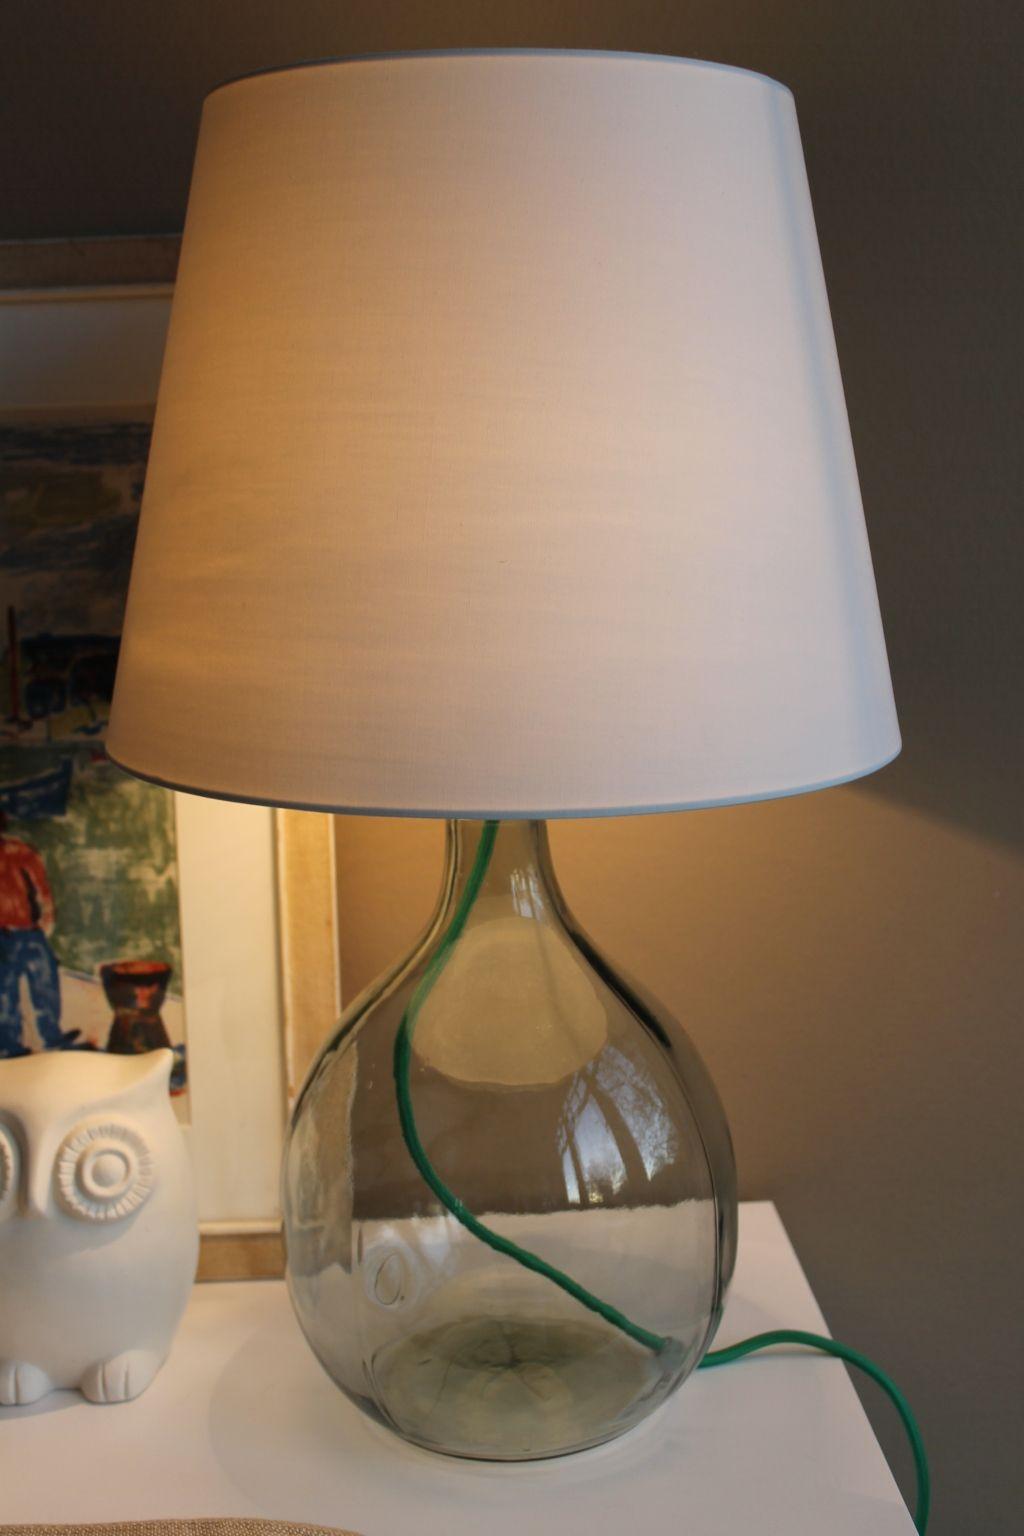 leuchte mit glasfu selber machen illumination. Black Bedroom Furniture Sets. Home Design Ideas